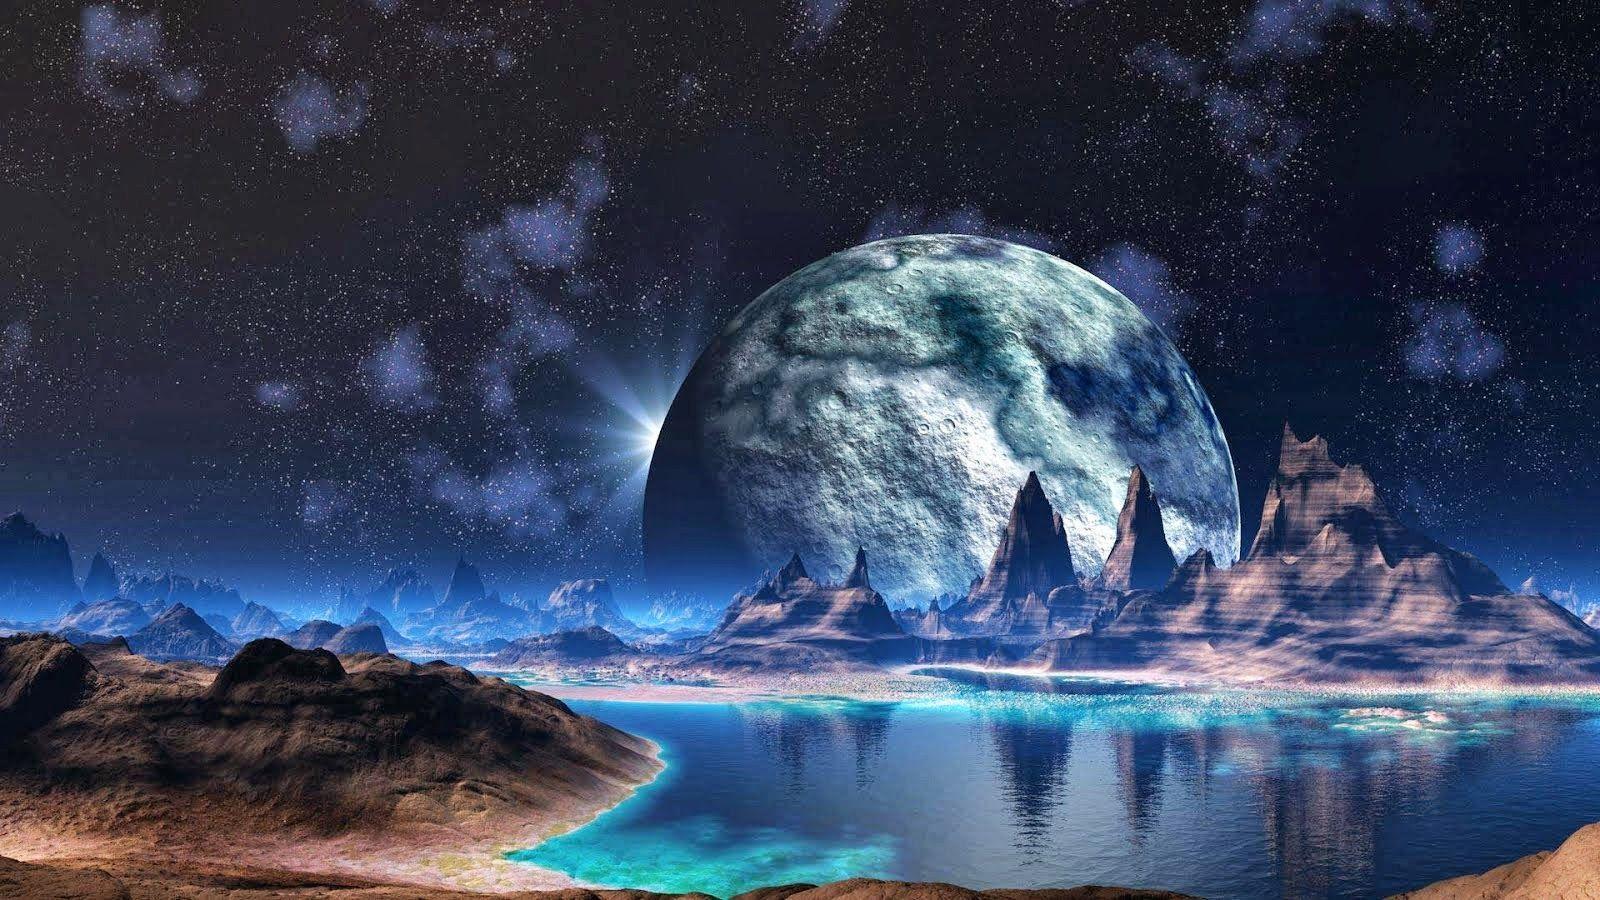 1080p Wallpapers Cool Desktop Backgrounds Space 11701 Hd